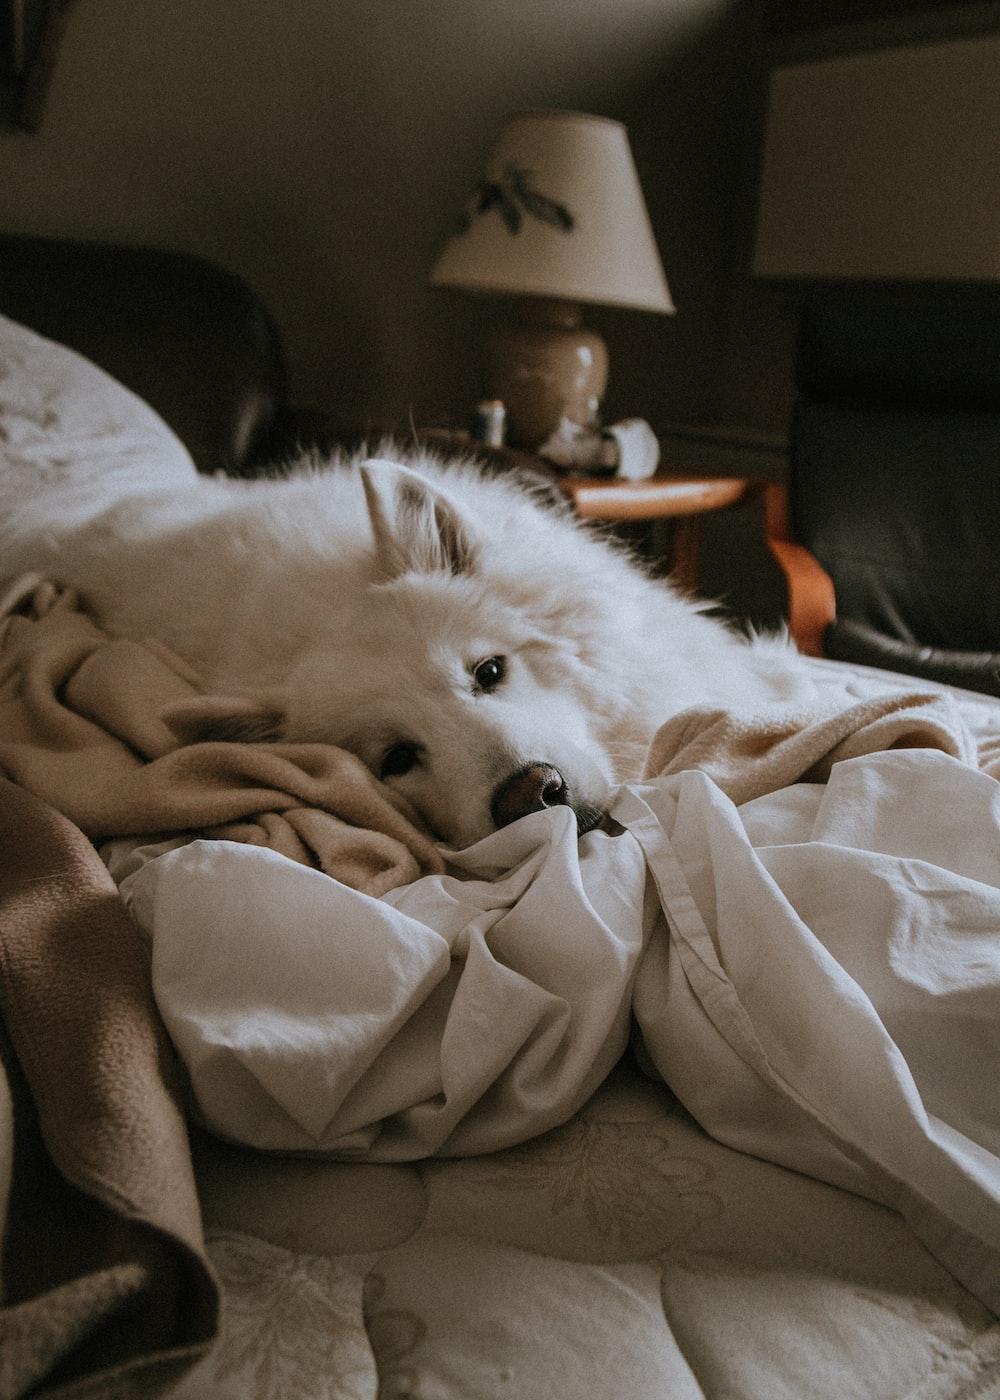 photo of medium white dog lying on white blanket